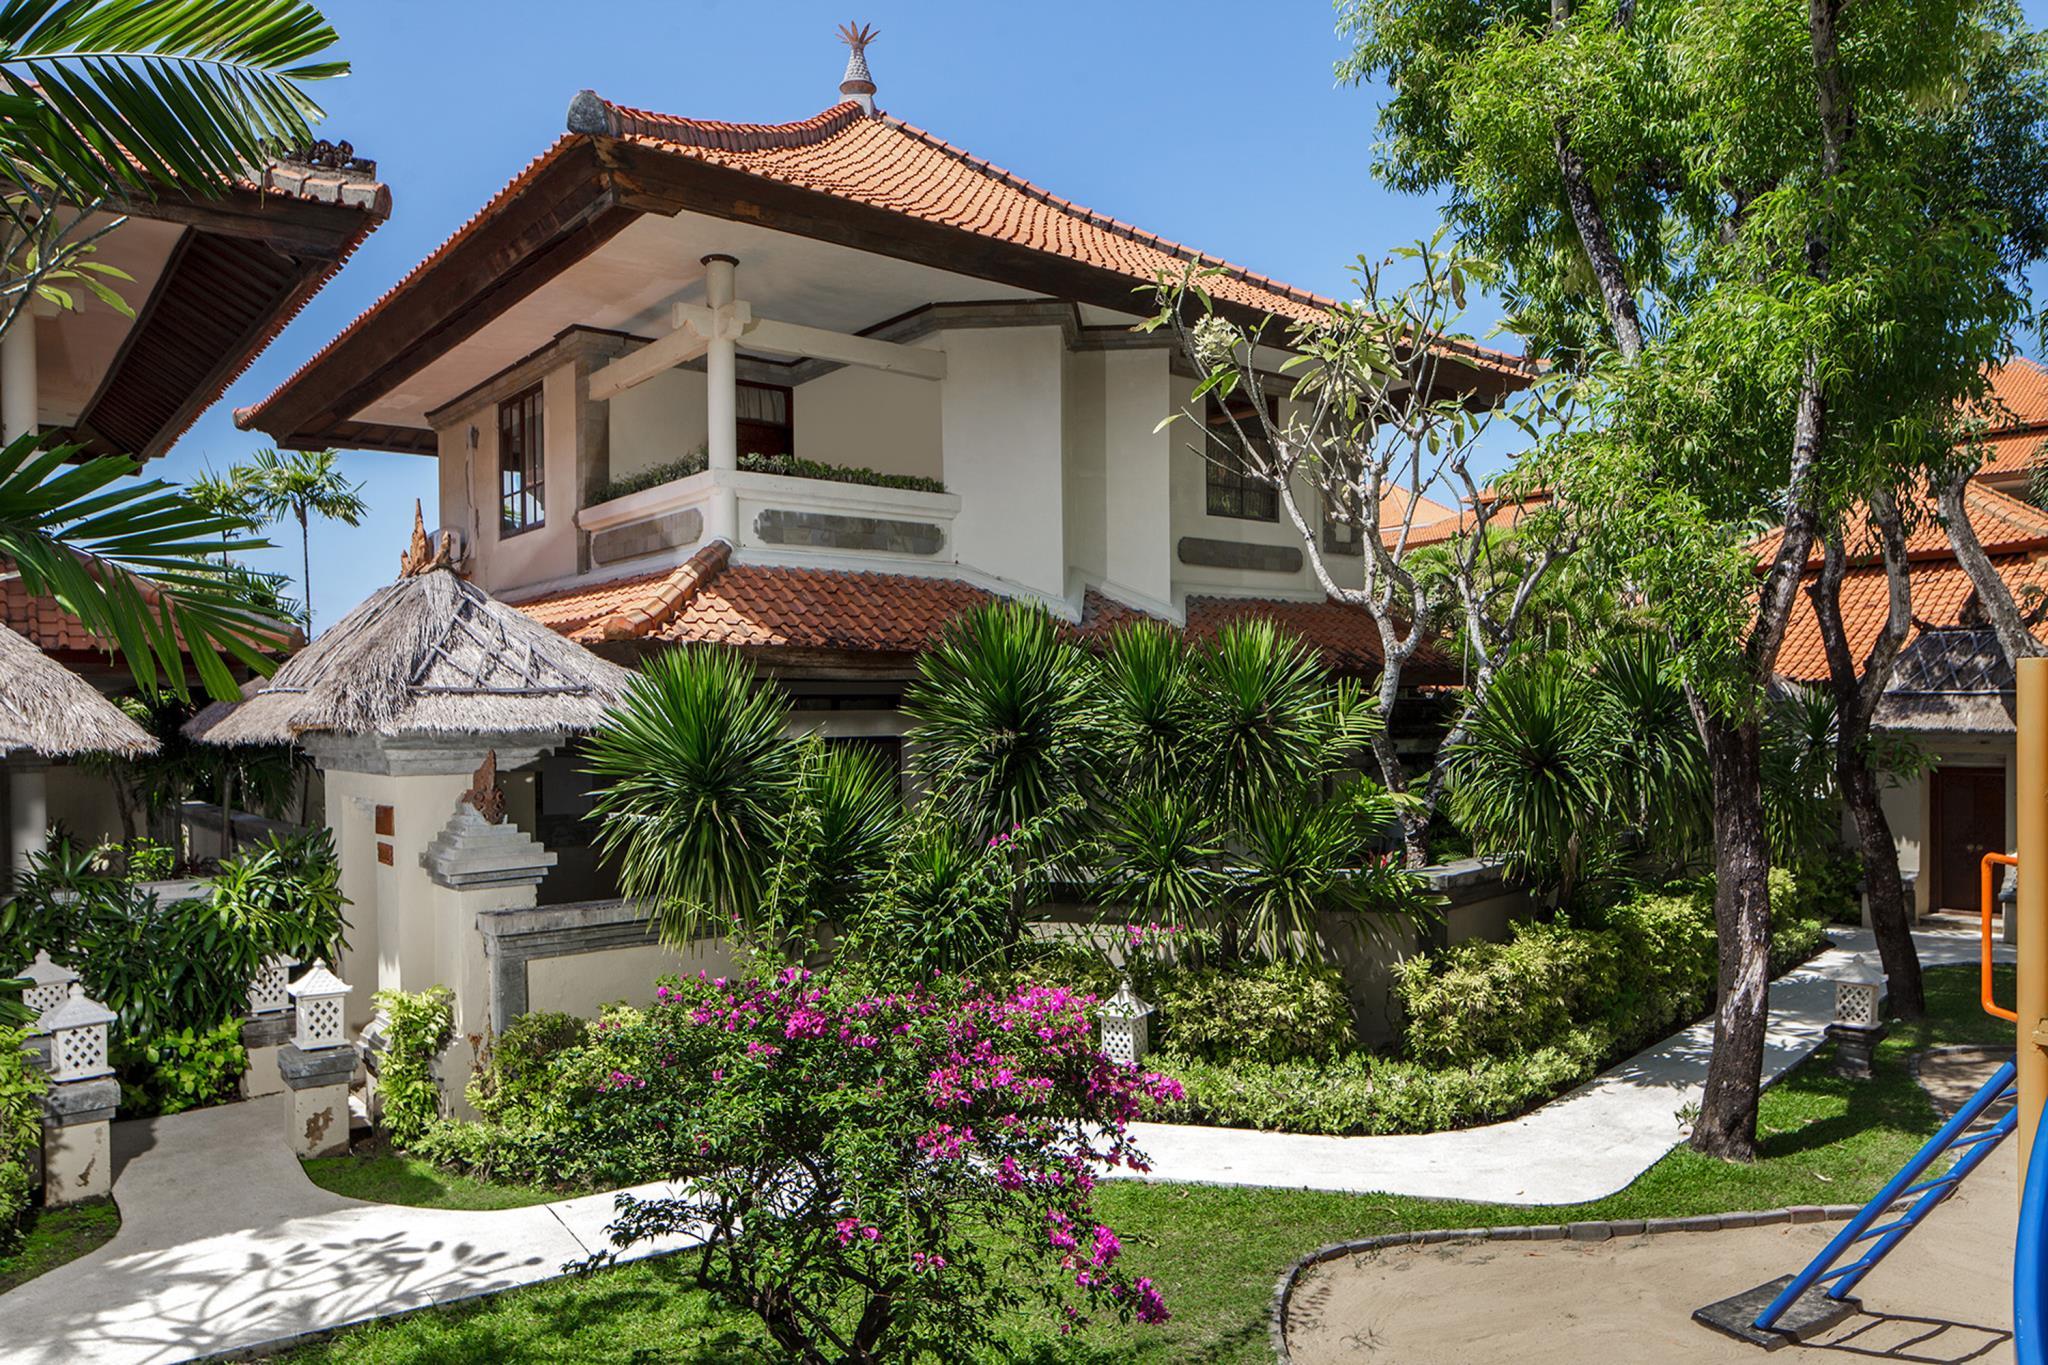 Фото Танжунг Беноа на Бали